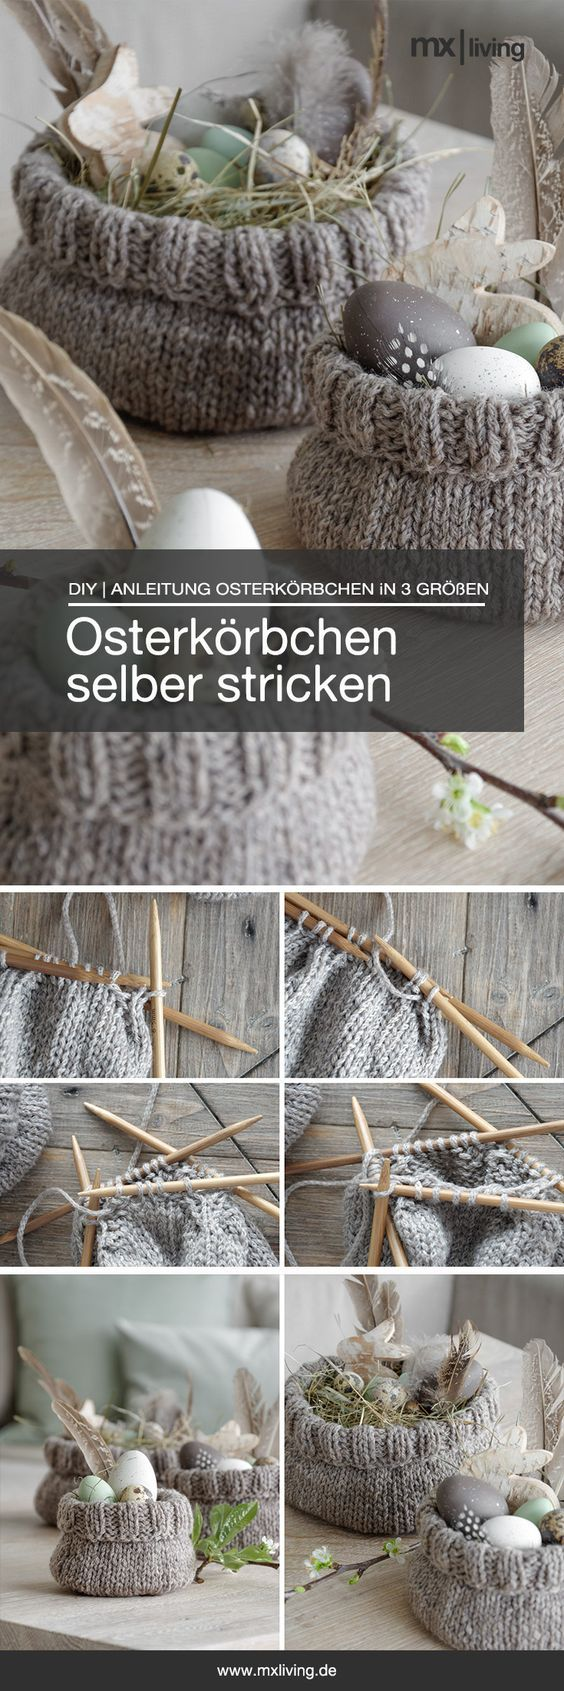 Photo of DIY | süße Osterkörbchen selber stricken – mxliving